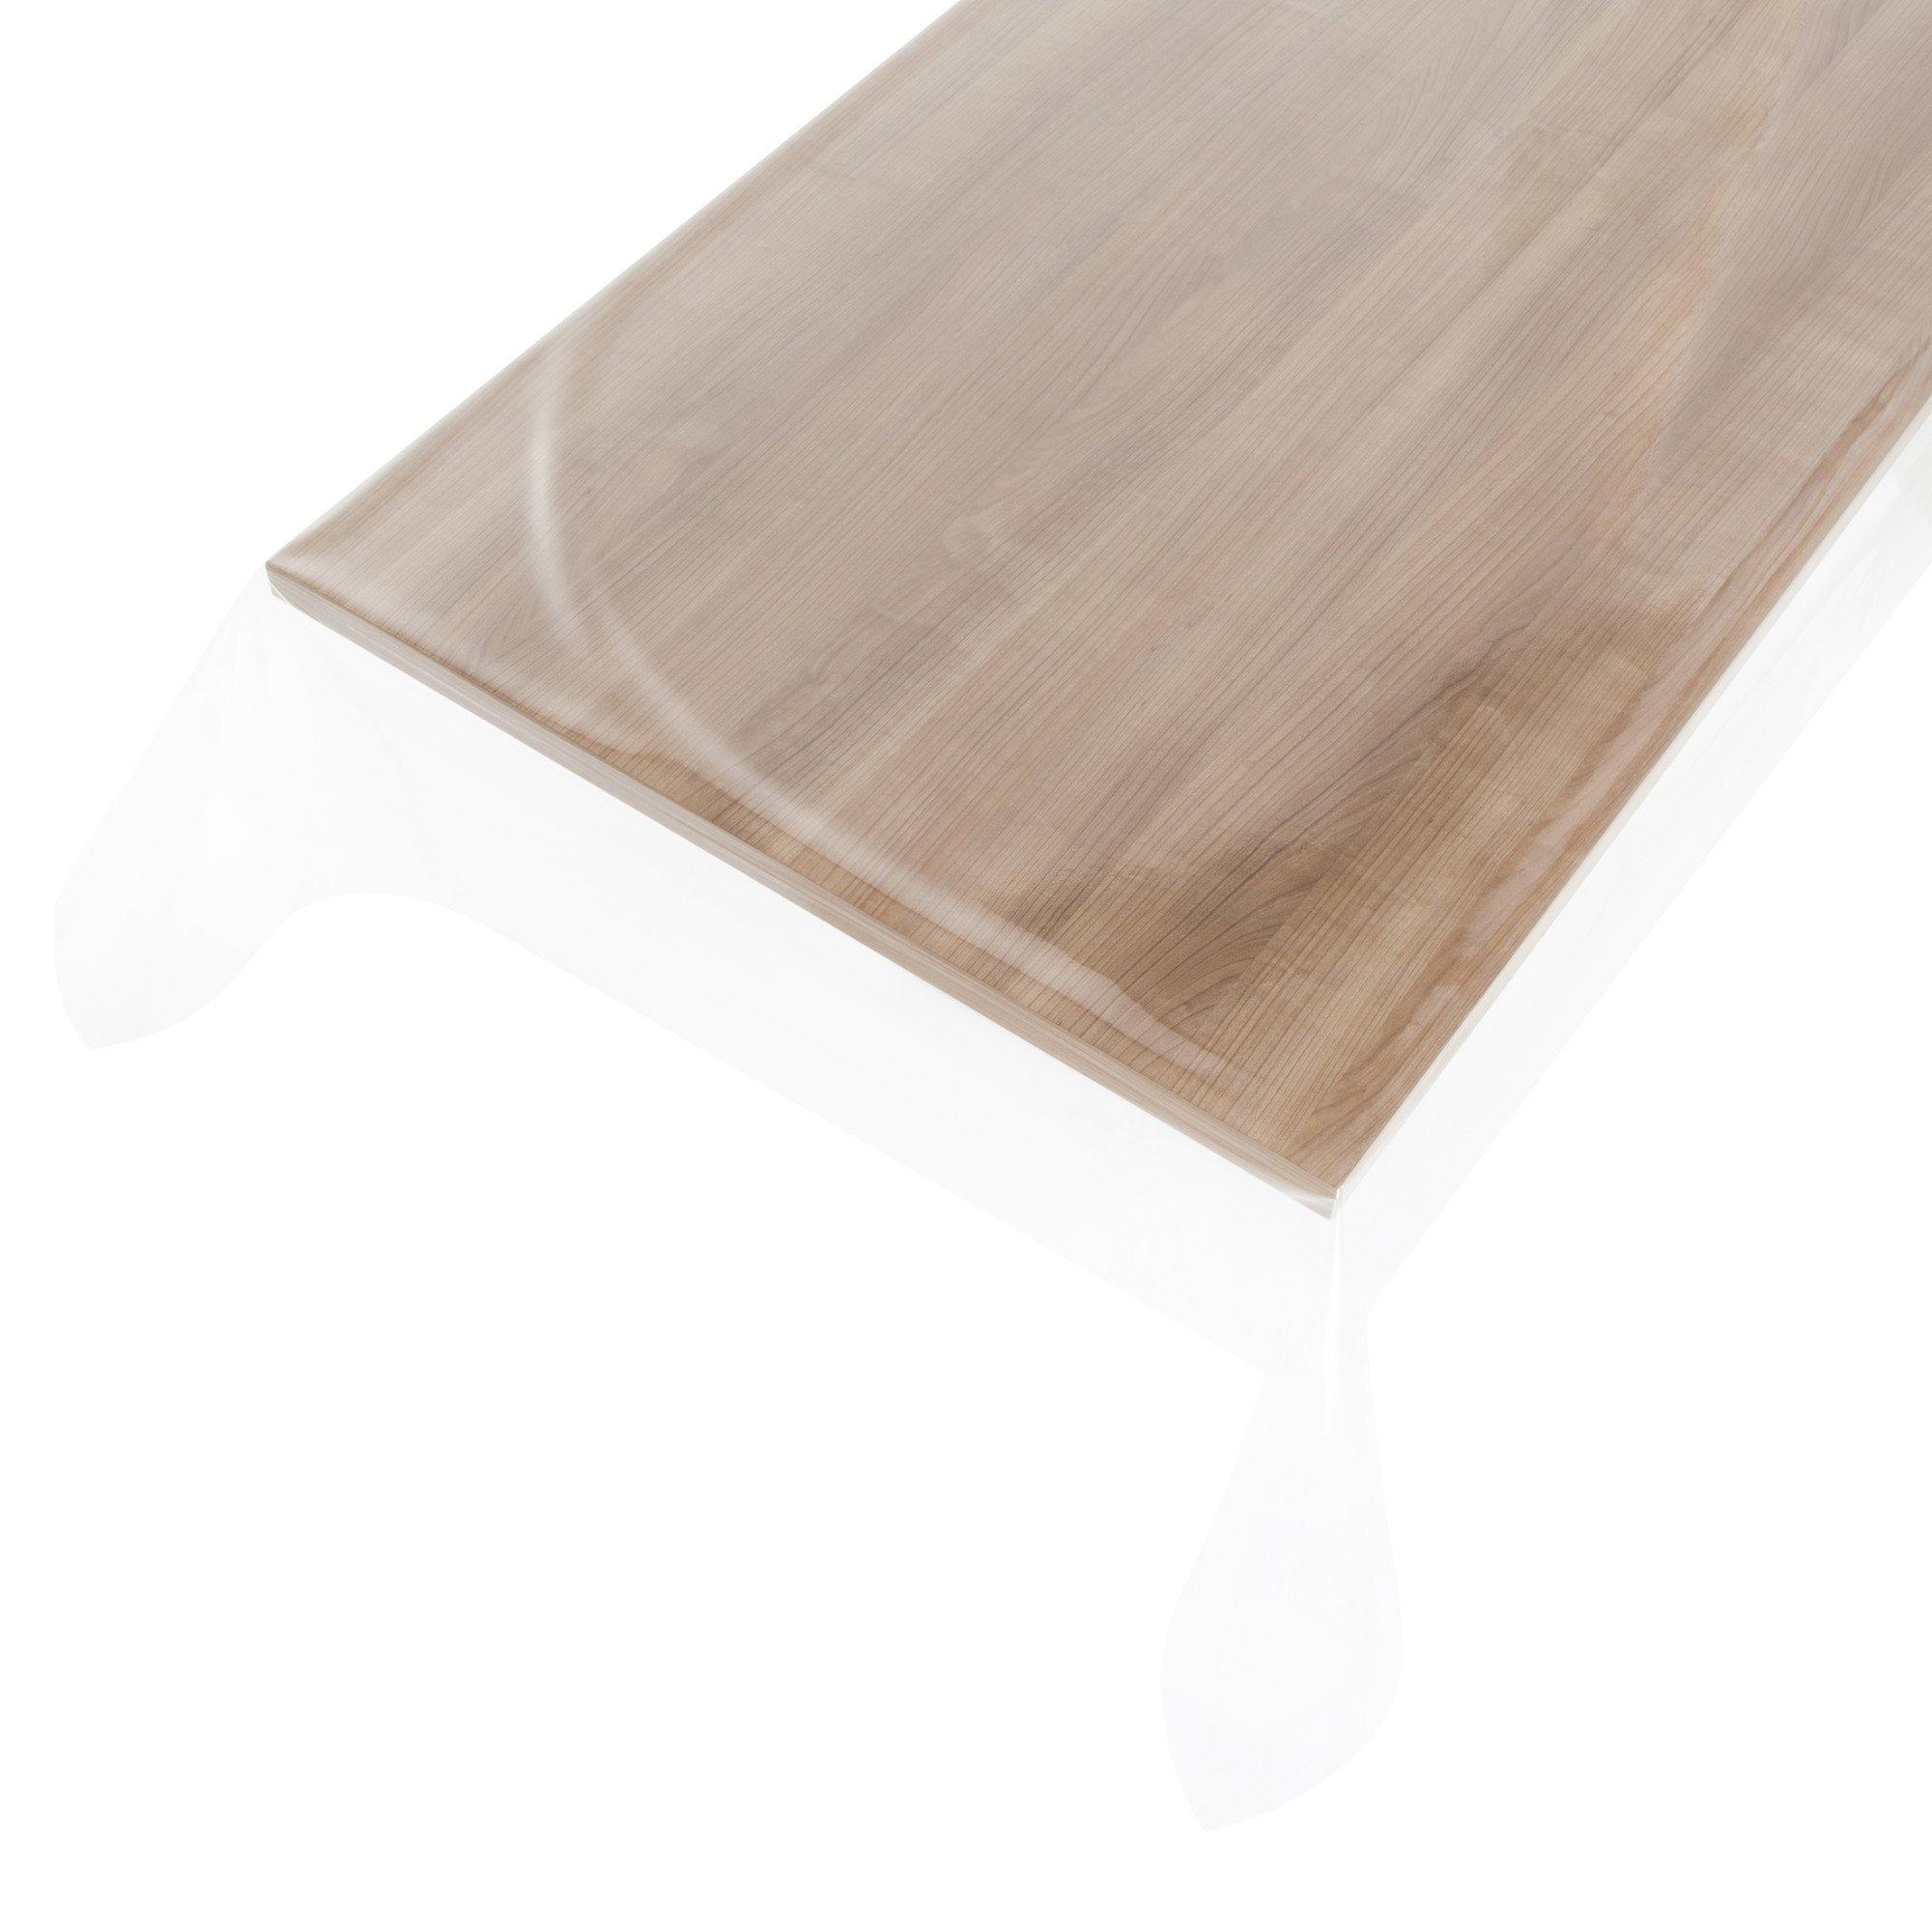 Doorzichtig tafelzeil Glashelder - 0,2mm